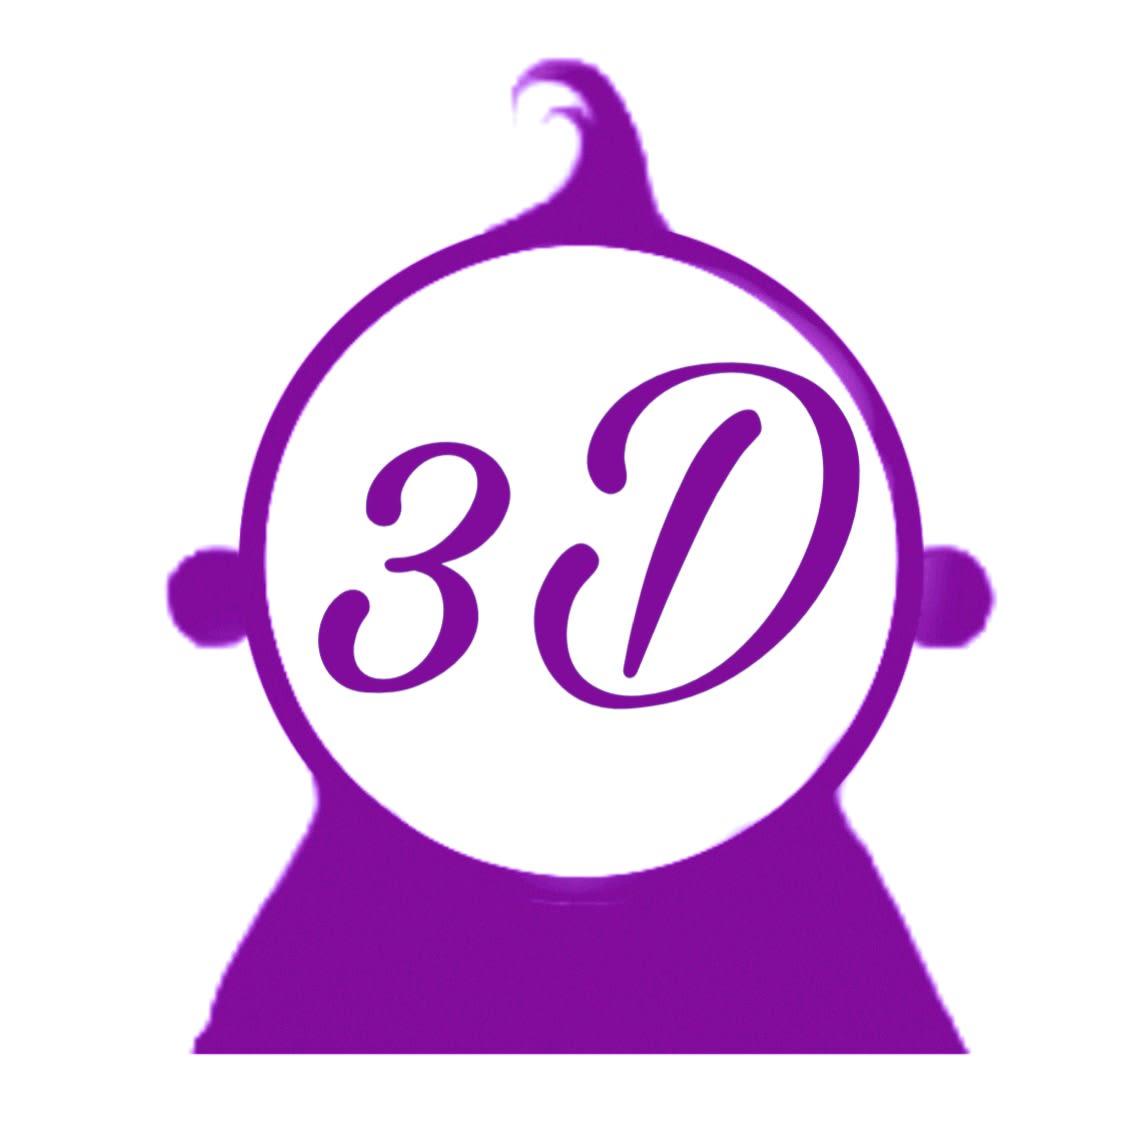 3D Babies Popup Cards Ltd - New Malden, London KT3 3RQ - 07455 516616 | ShowMeLocal.com